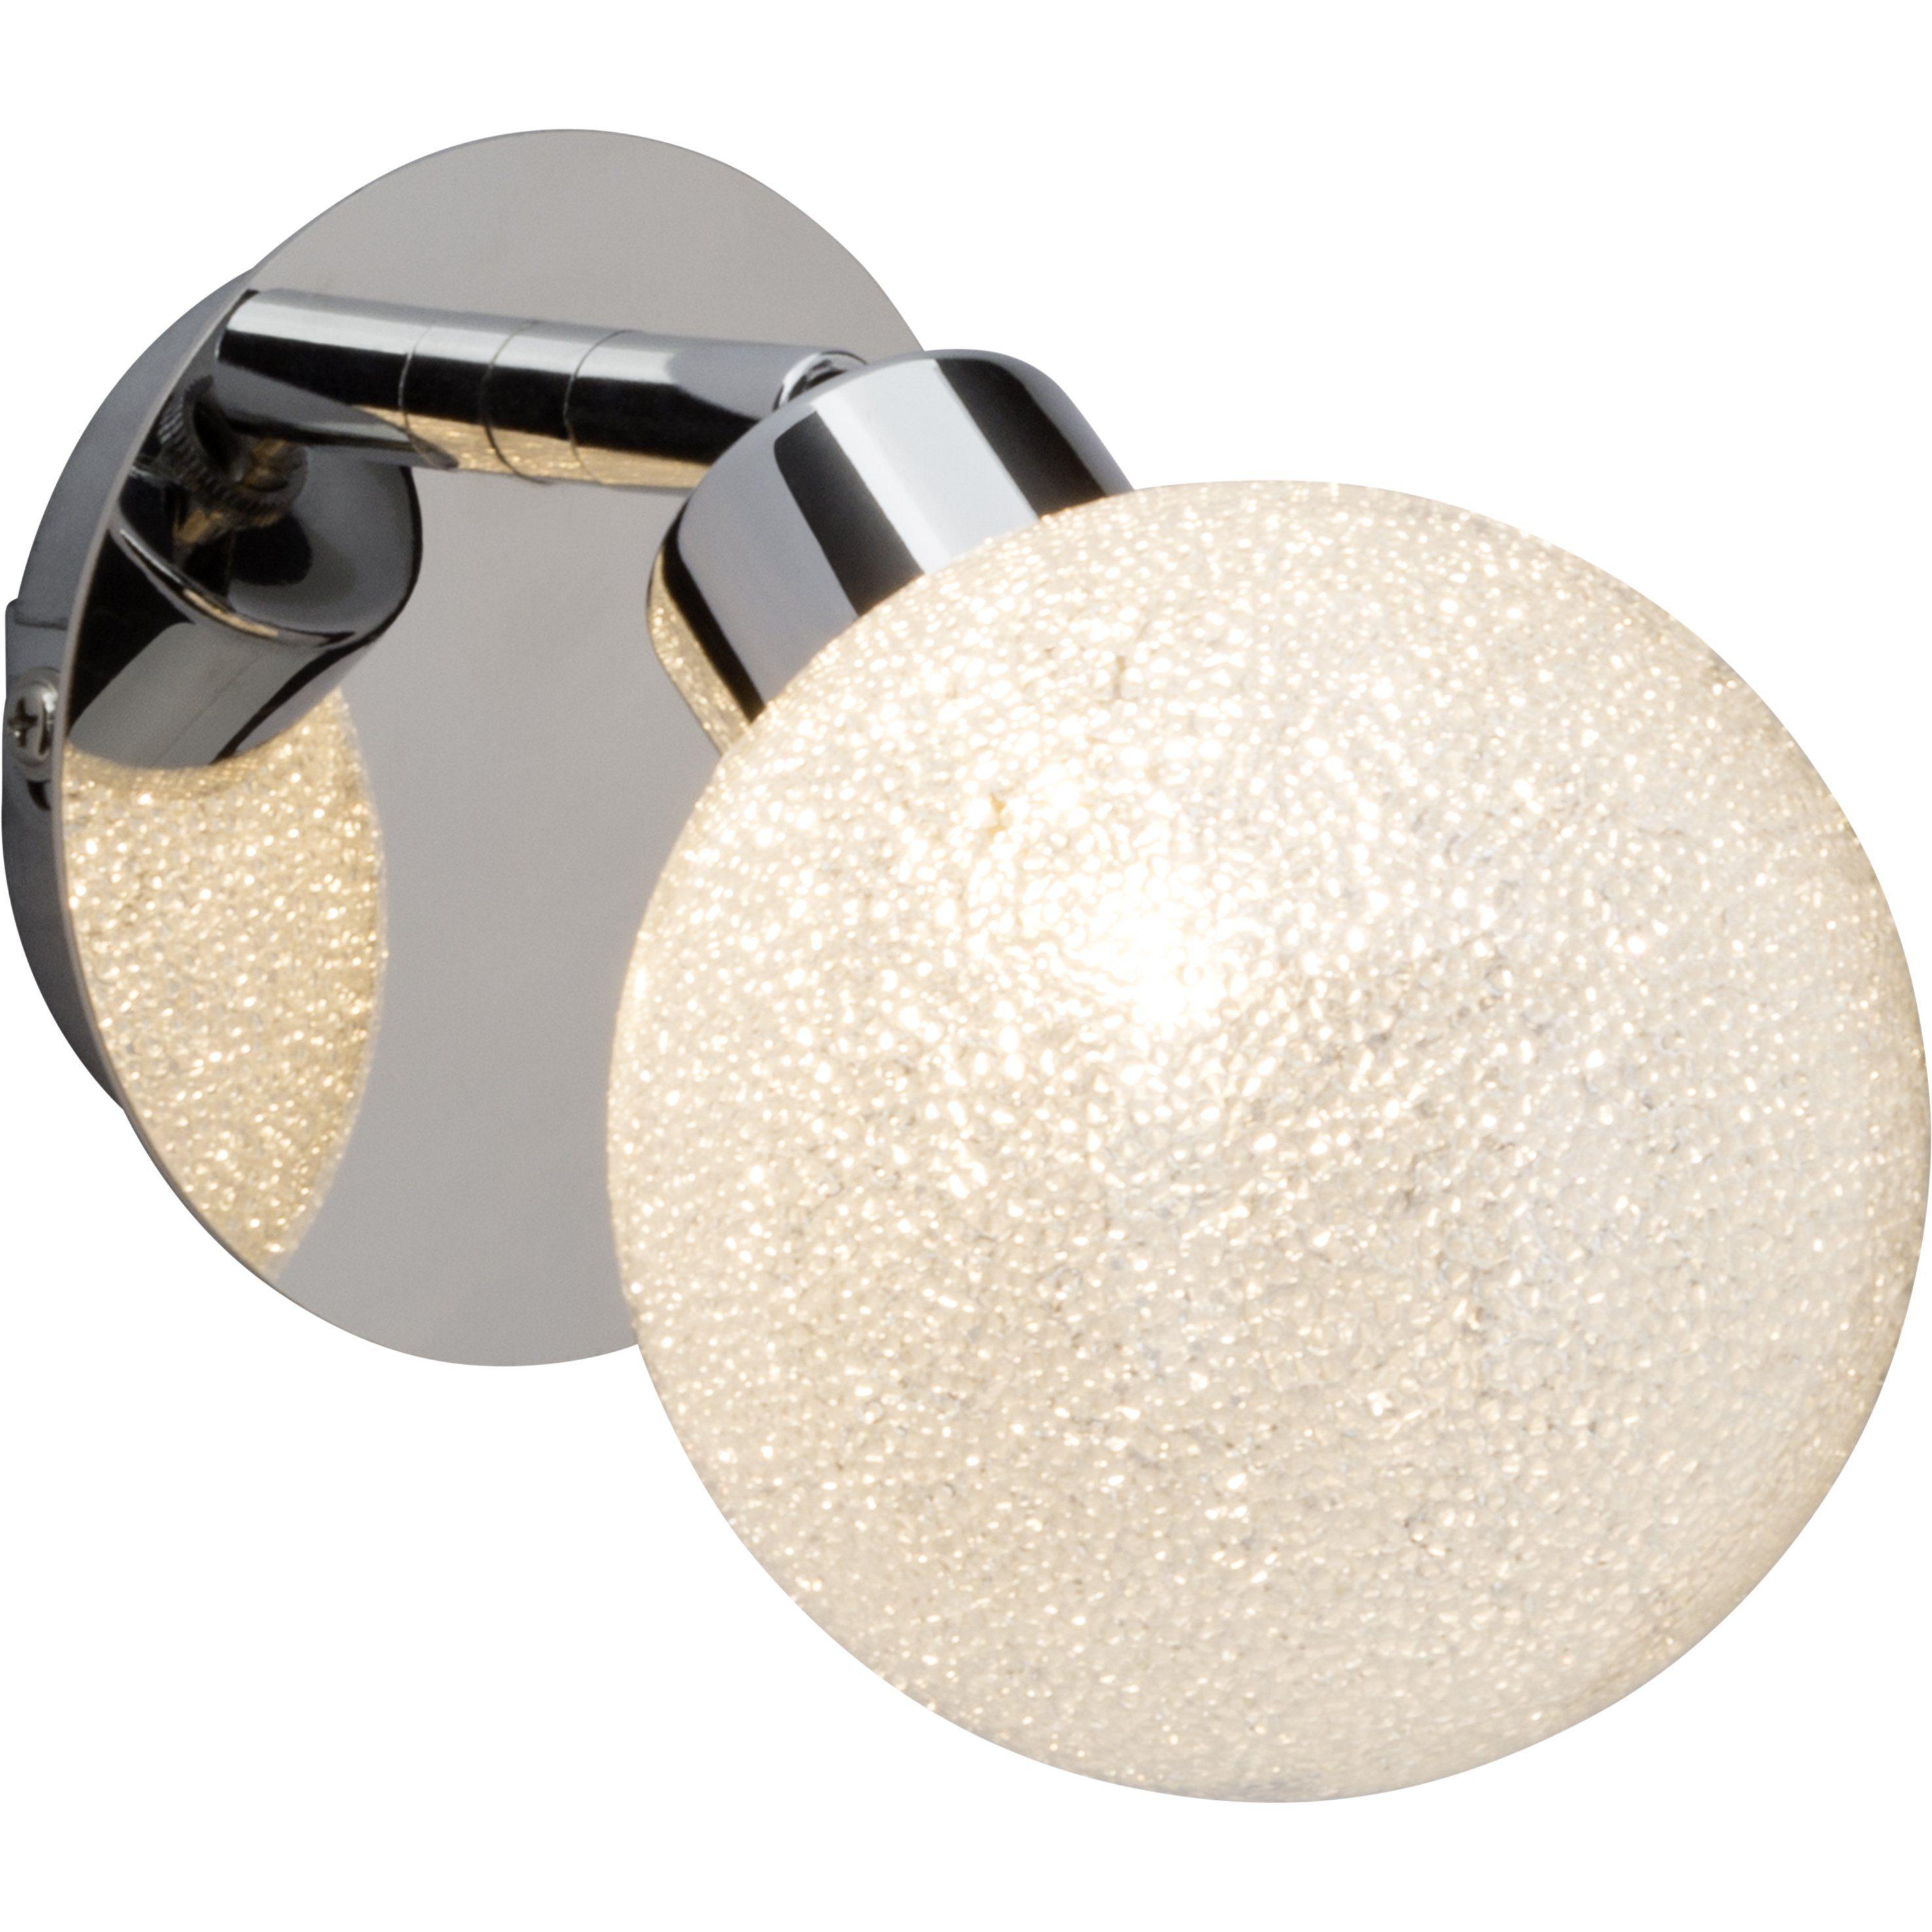 Brilliant Leuchten Pacome LED Wandspot chrom